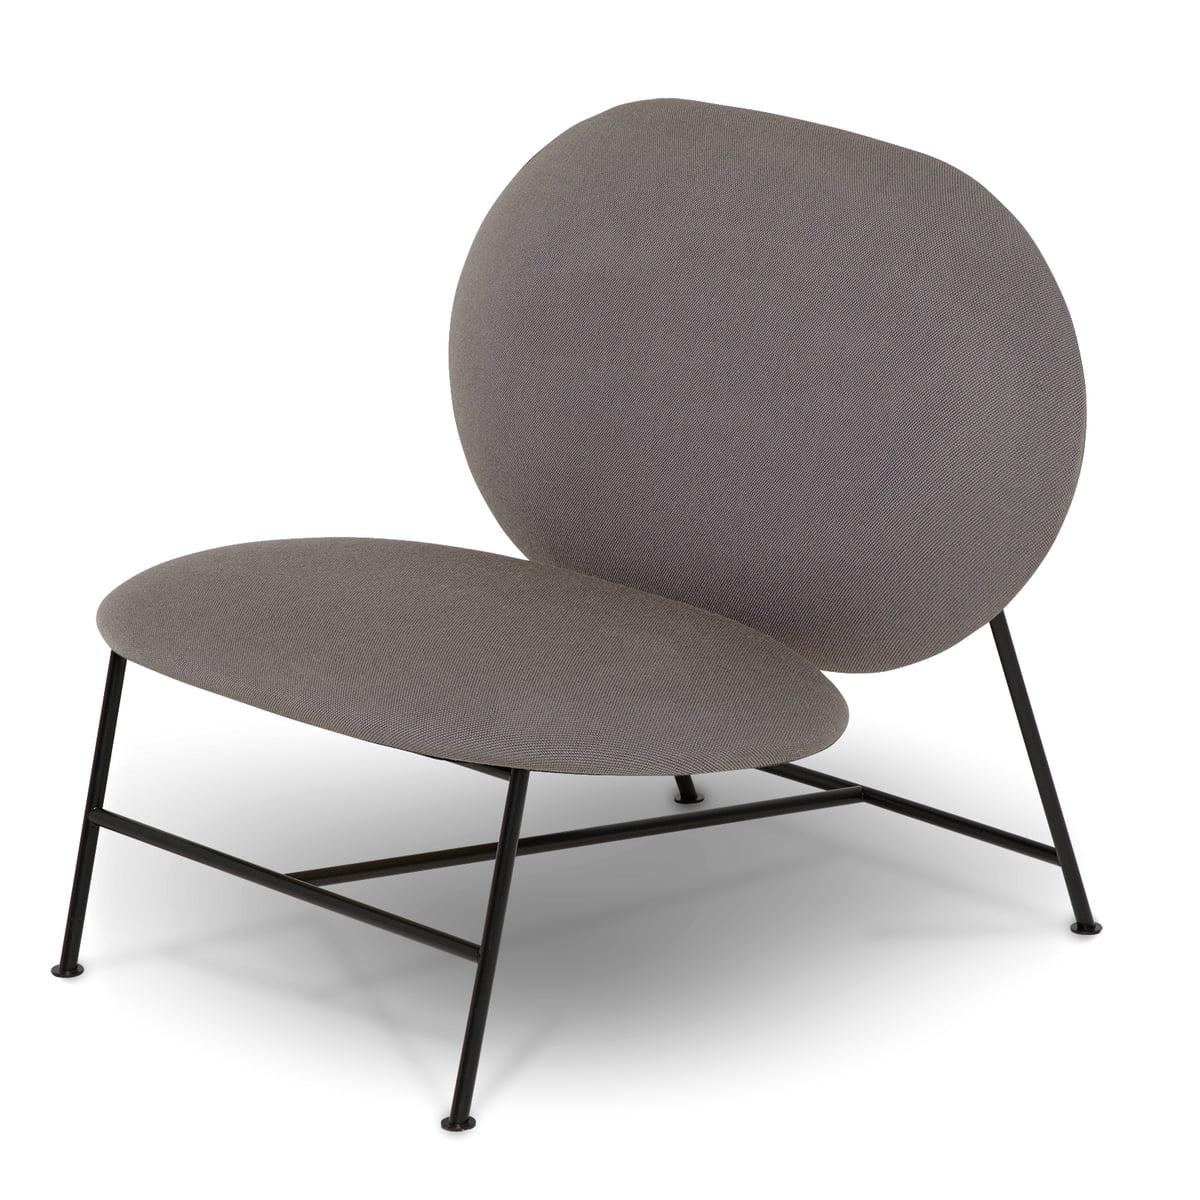 Northern - Oblong Lounge Chair, schwarz / grau (Brusvik 05) | Wohnzimmer > Sessel > Loungesessel | Hellgrau | Stahl | Northern